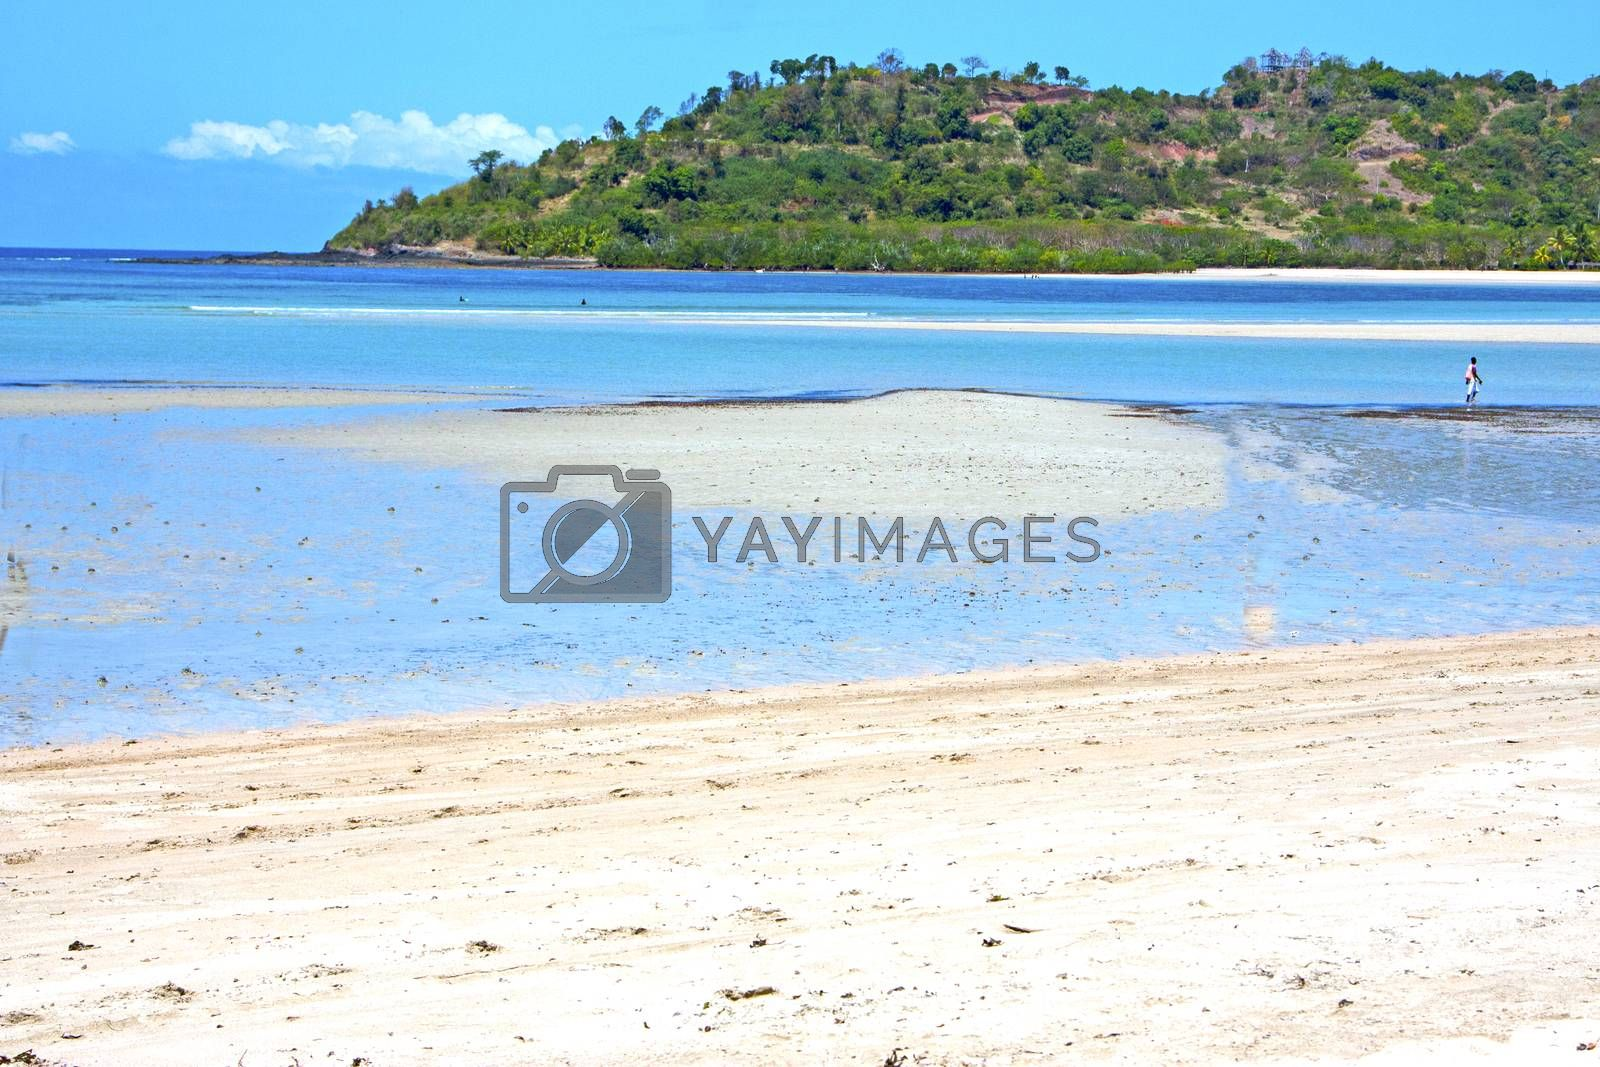 beautiful andilana beach seaweed  indian ocean   by lkpro